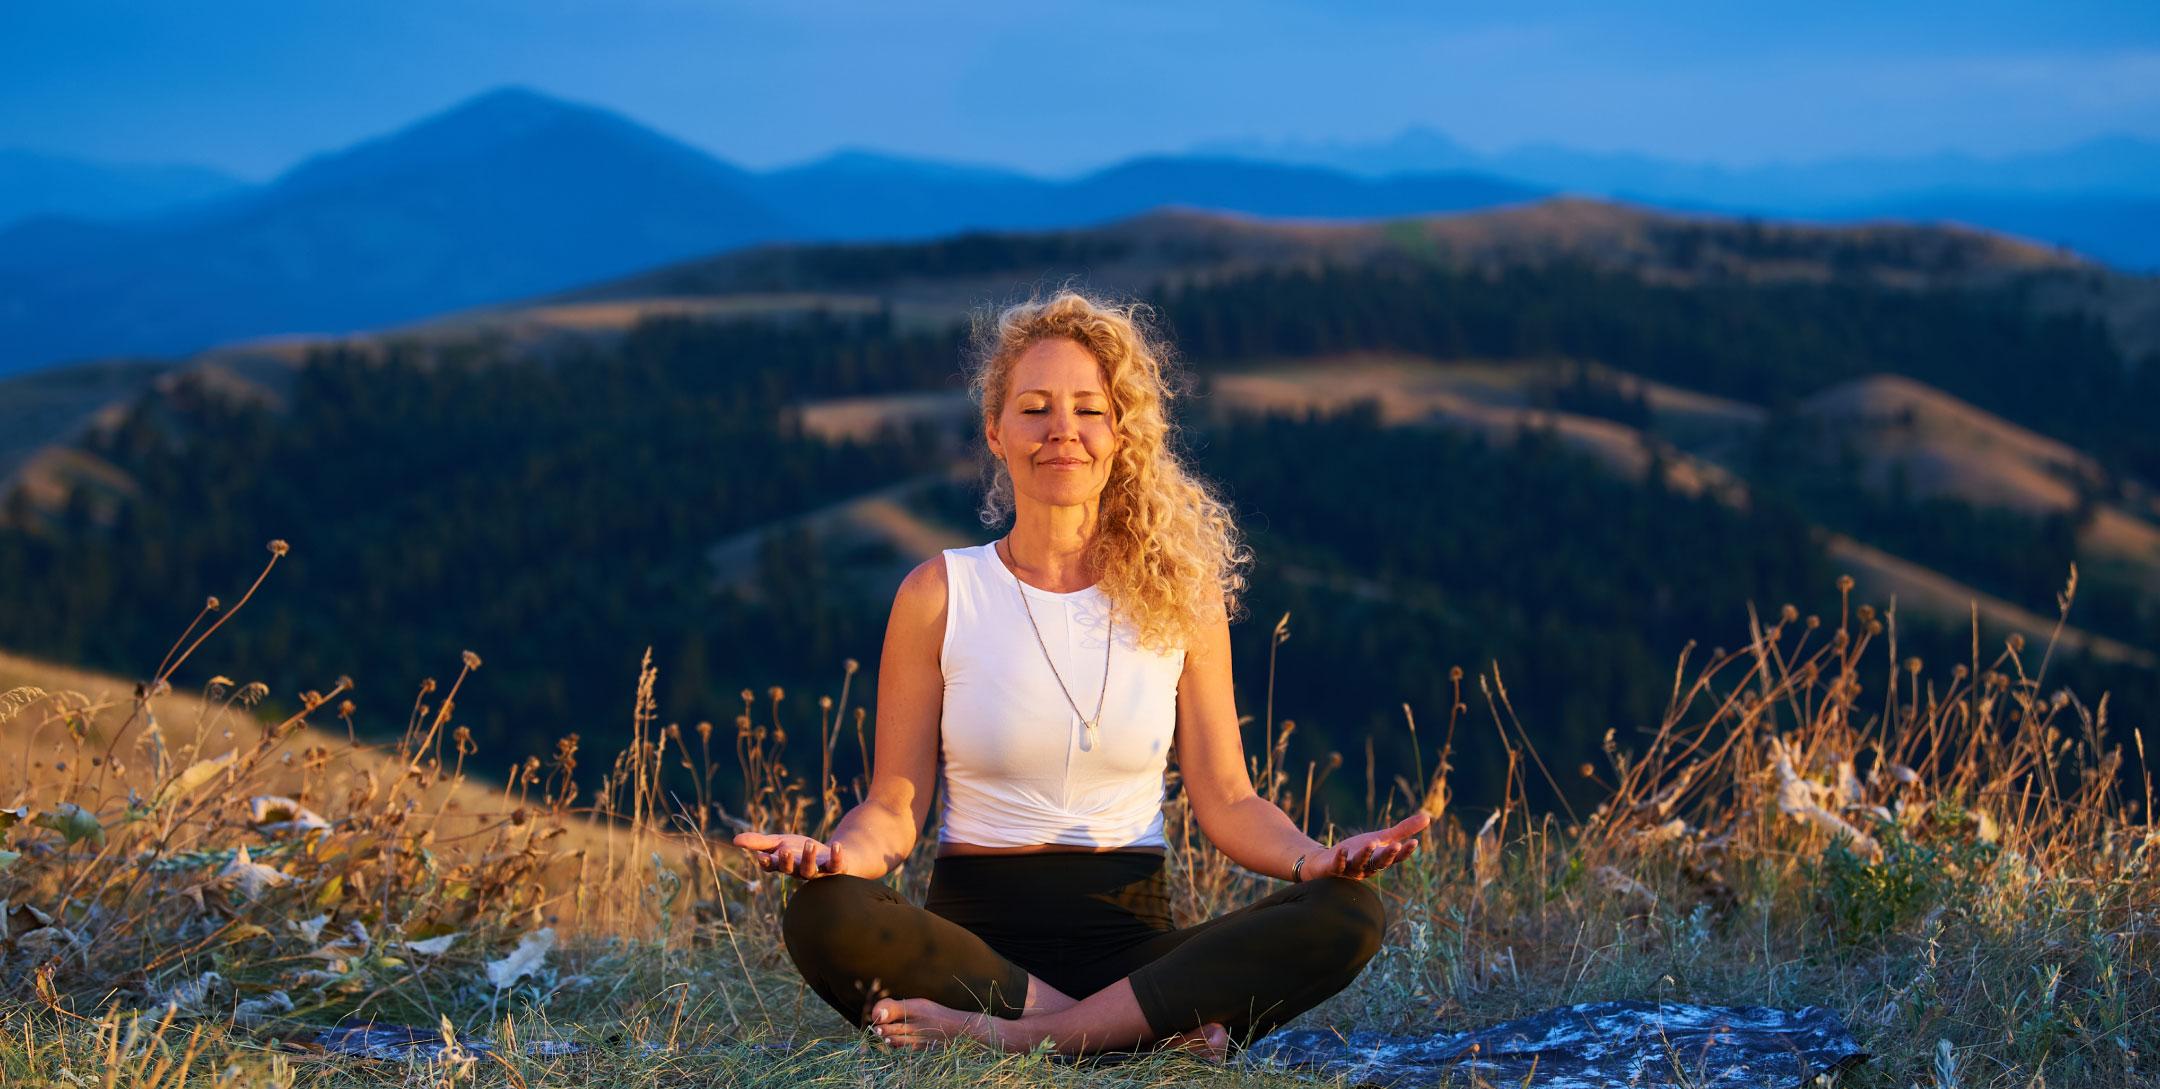 Woman meditates on blanket in a field